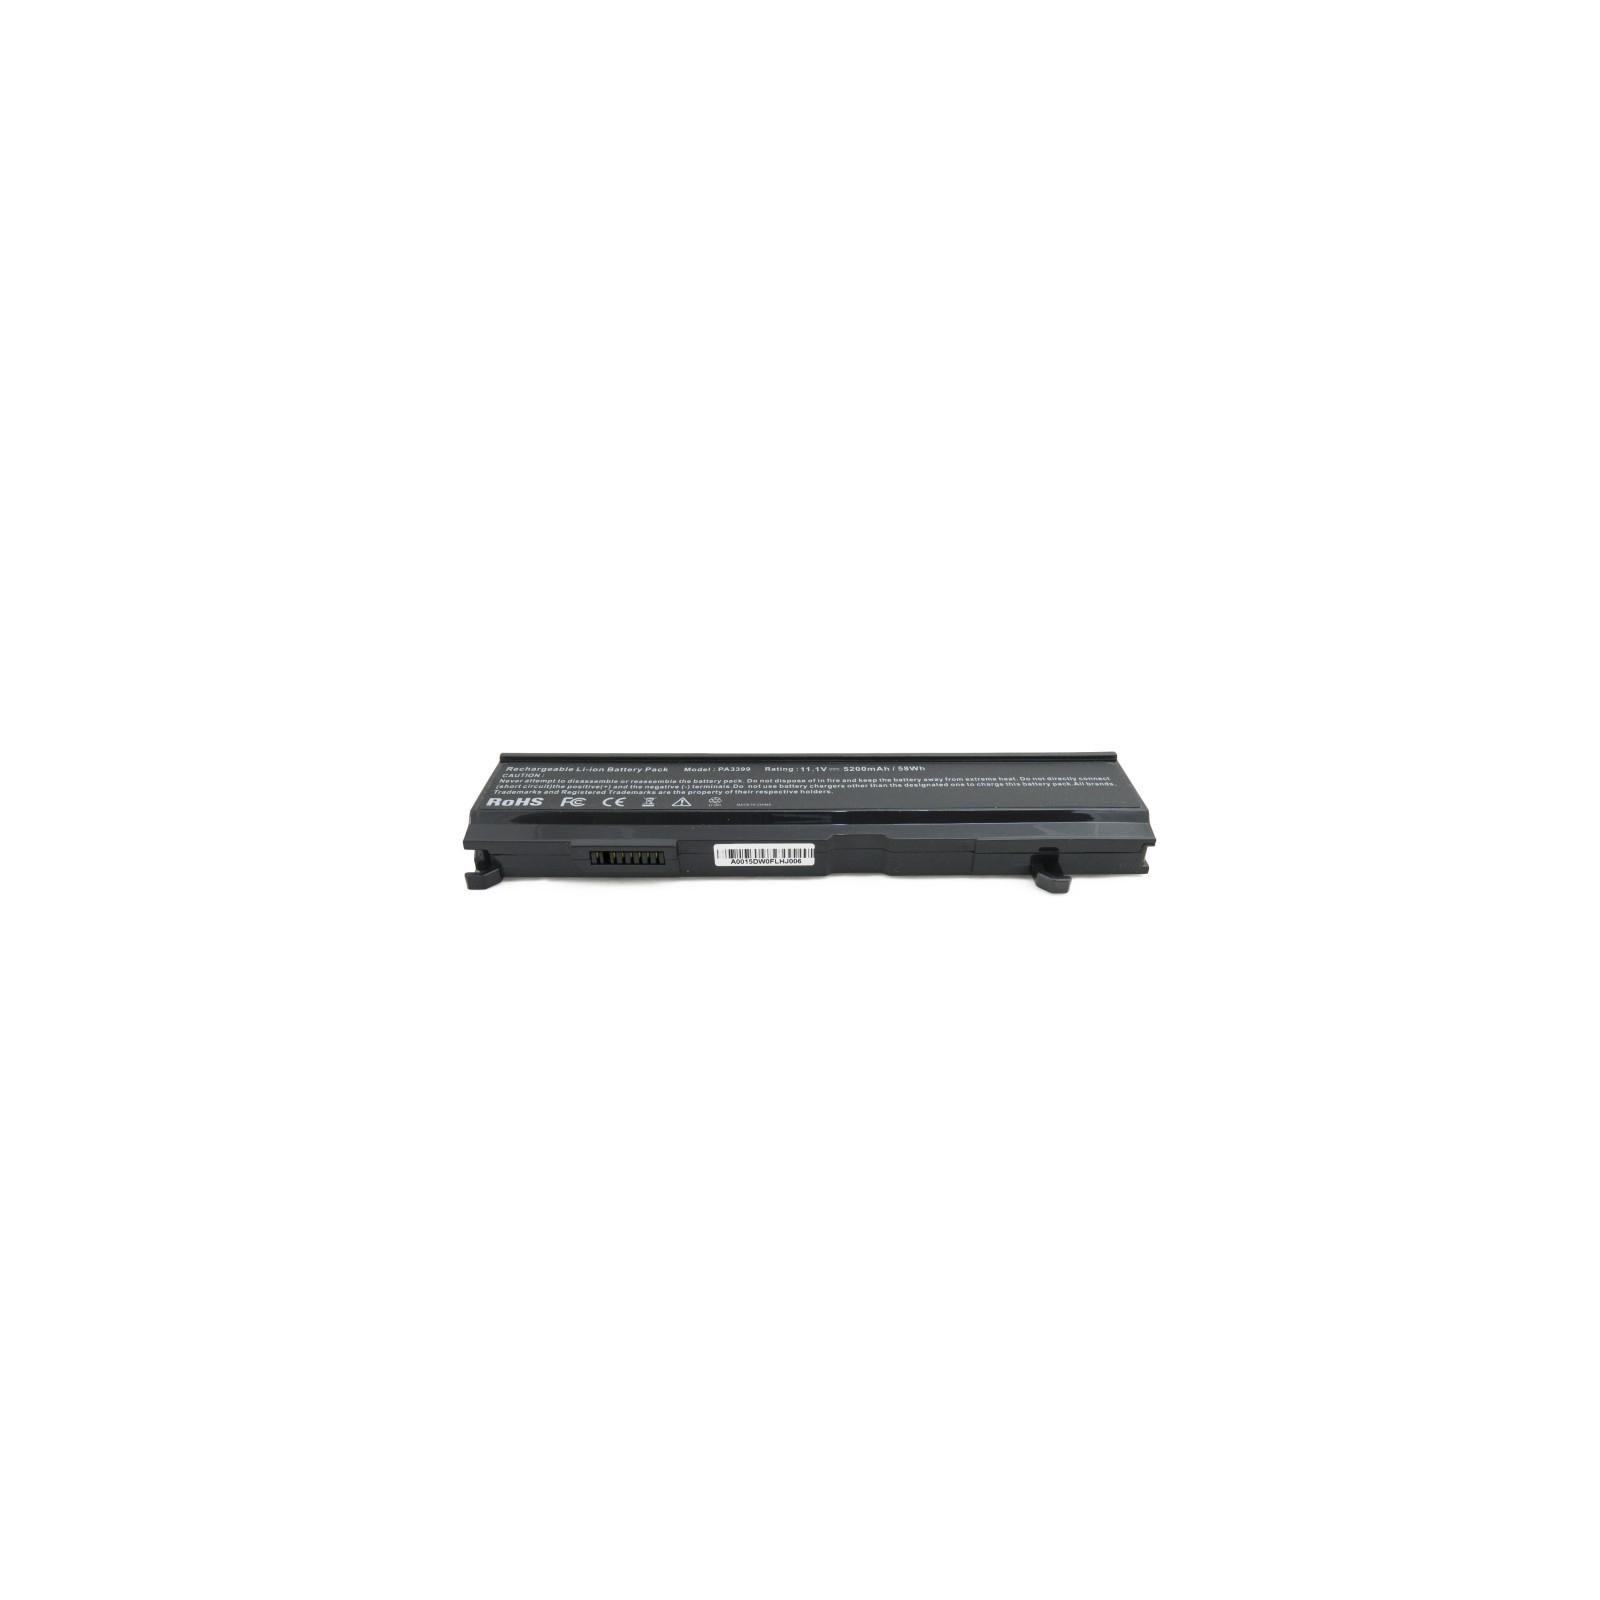 Аккумулятор для ноутбука Toshiba Satellite A80 (PA3399U) 5200 mAh EXTRADIGITAL (BNT3959) изображение 4